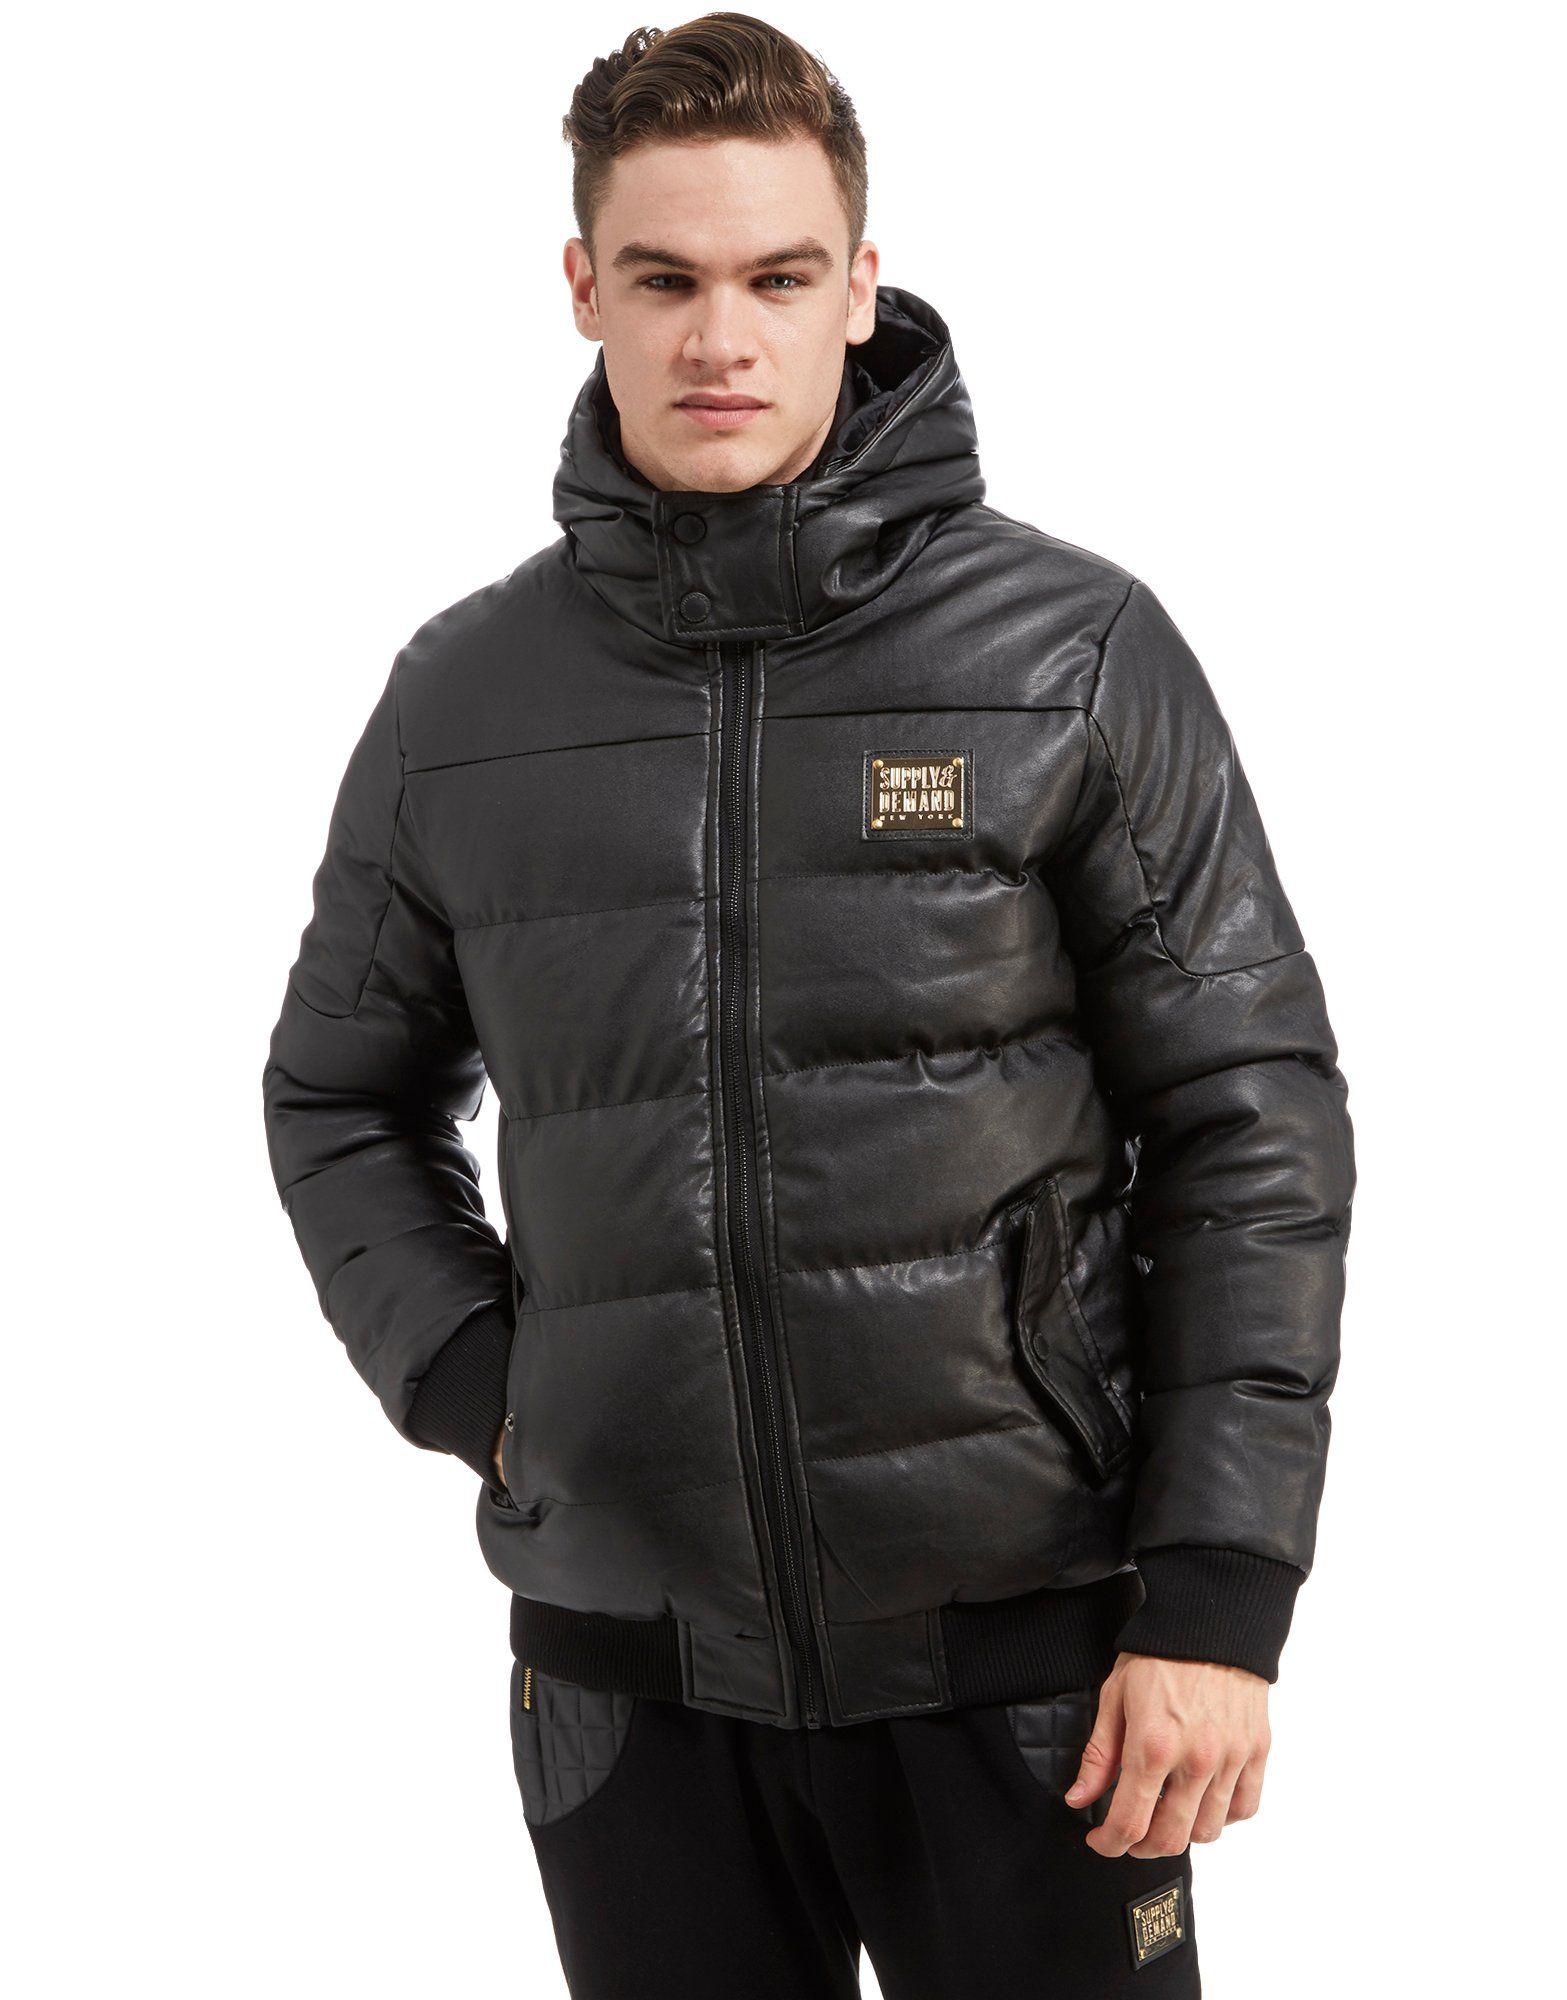 bf4e7fbf52e2 Supply   Demand Toronto Jacket